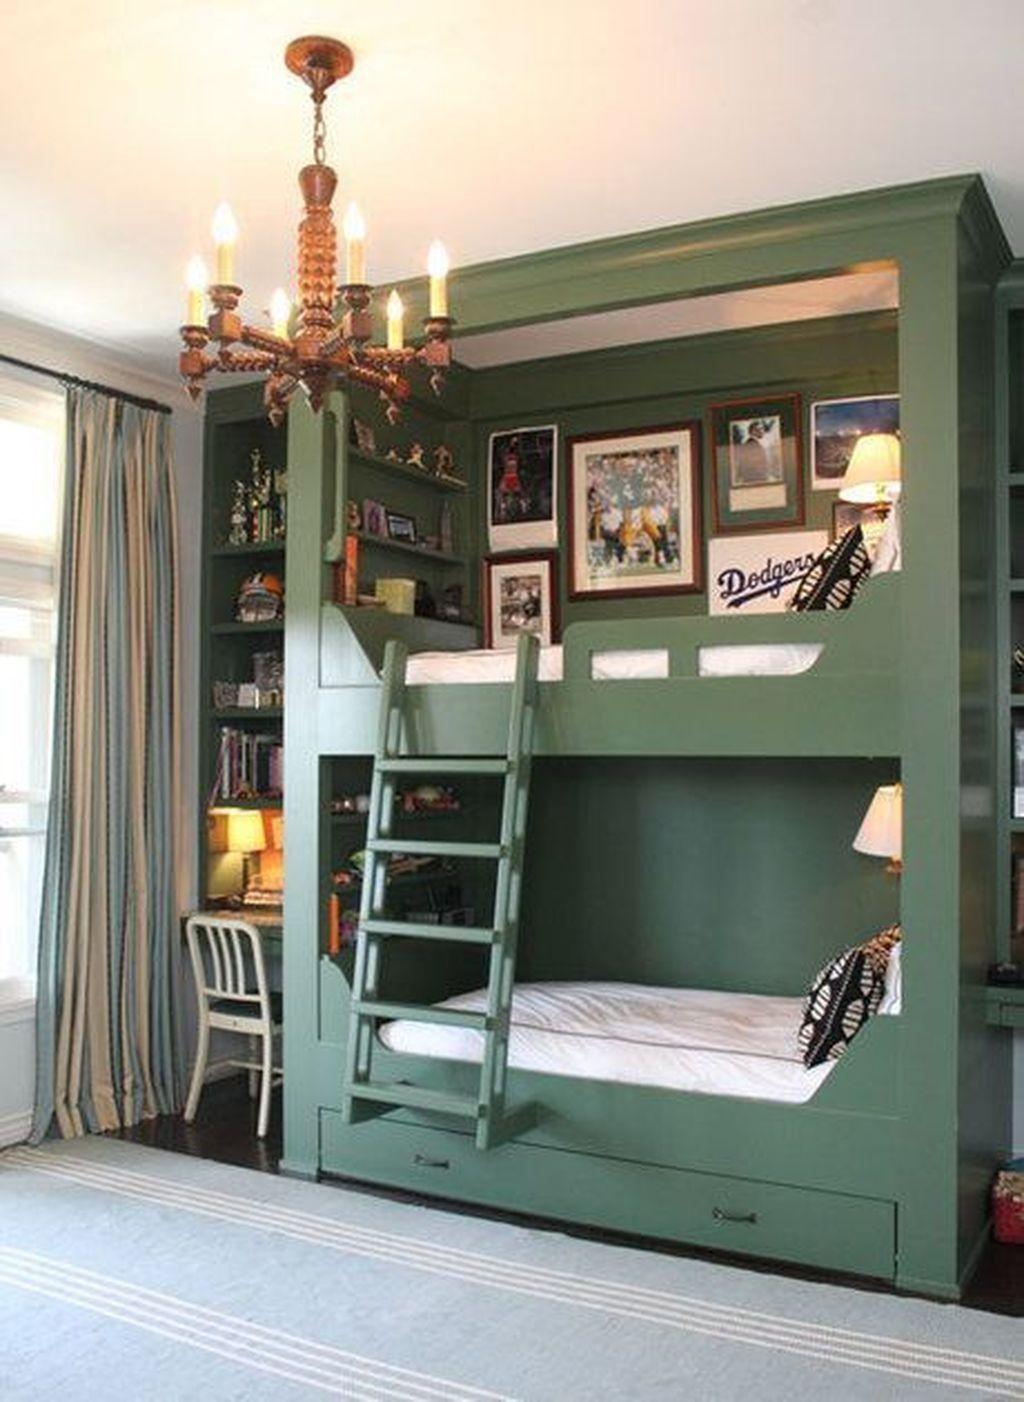 Bunk bed loft ideas   Stunning Kids Beds Loft Bunk Bed Furniture Ideas in